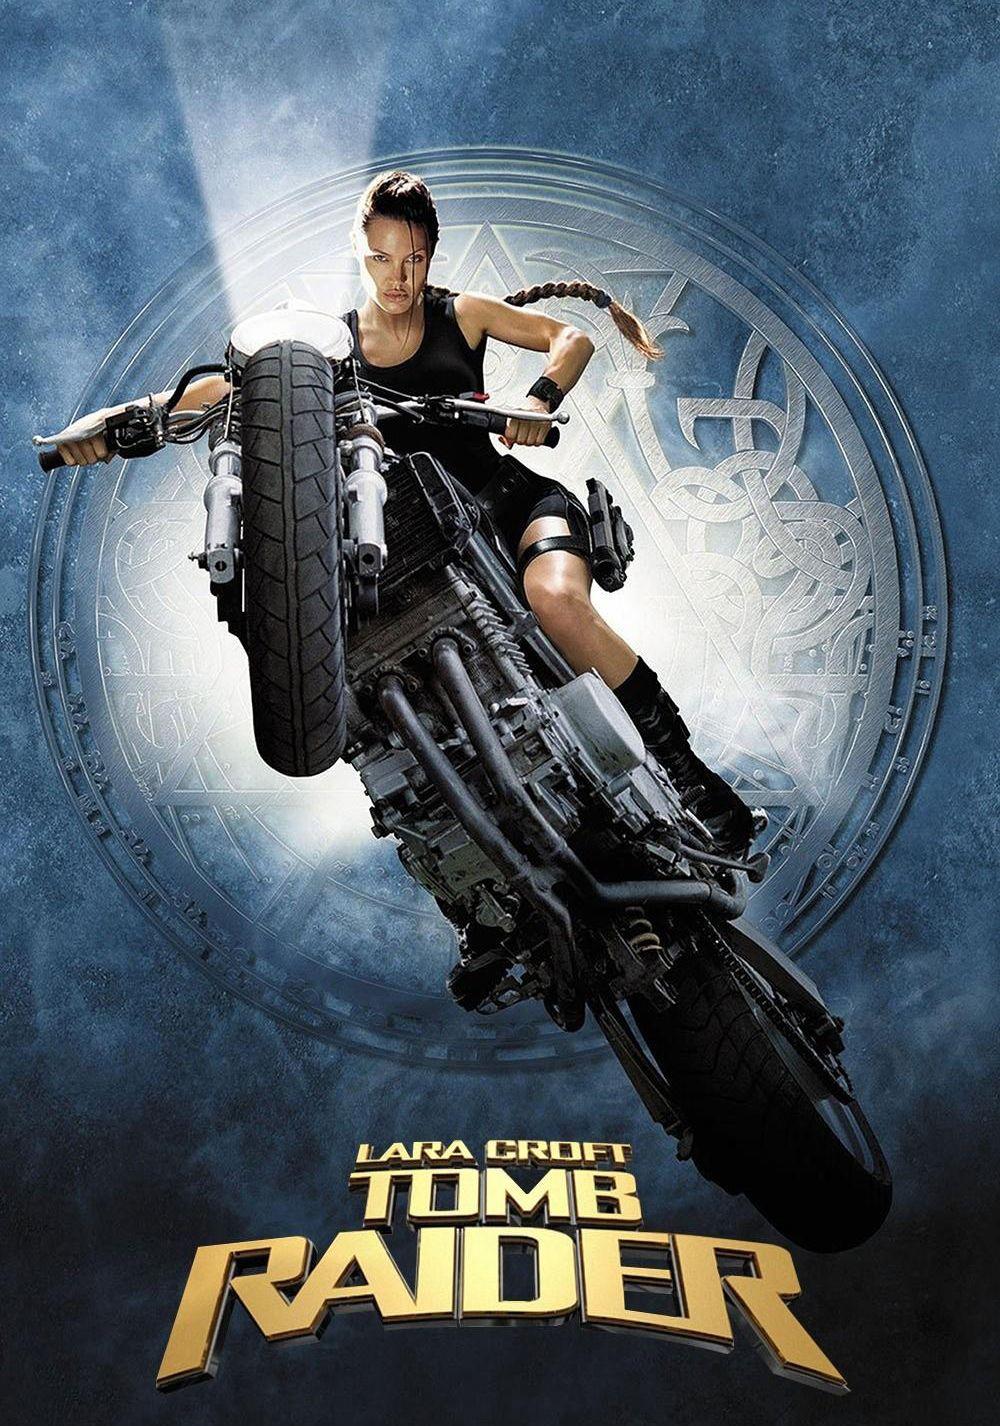 Lara Croft Tomb Raider Movie Poster Yahoo Image Search Results